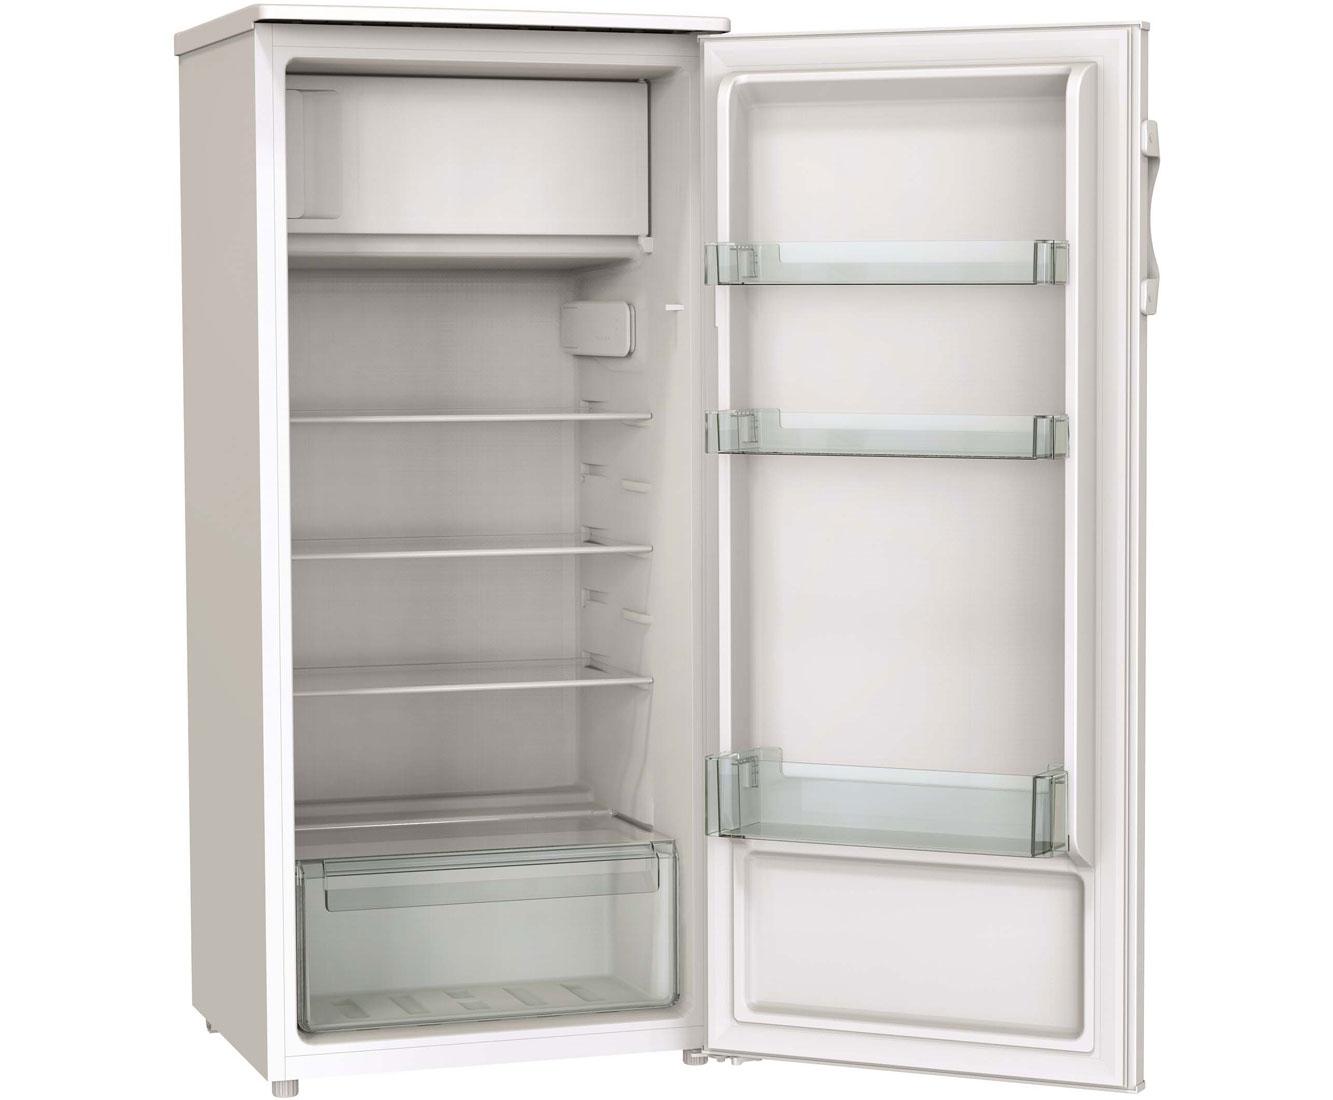 Gorenje Kühlschrank B Ware : Gorenje rb anw kühlschrank freistehend cm weiss neu ebay